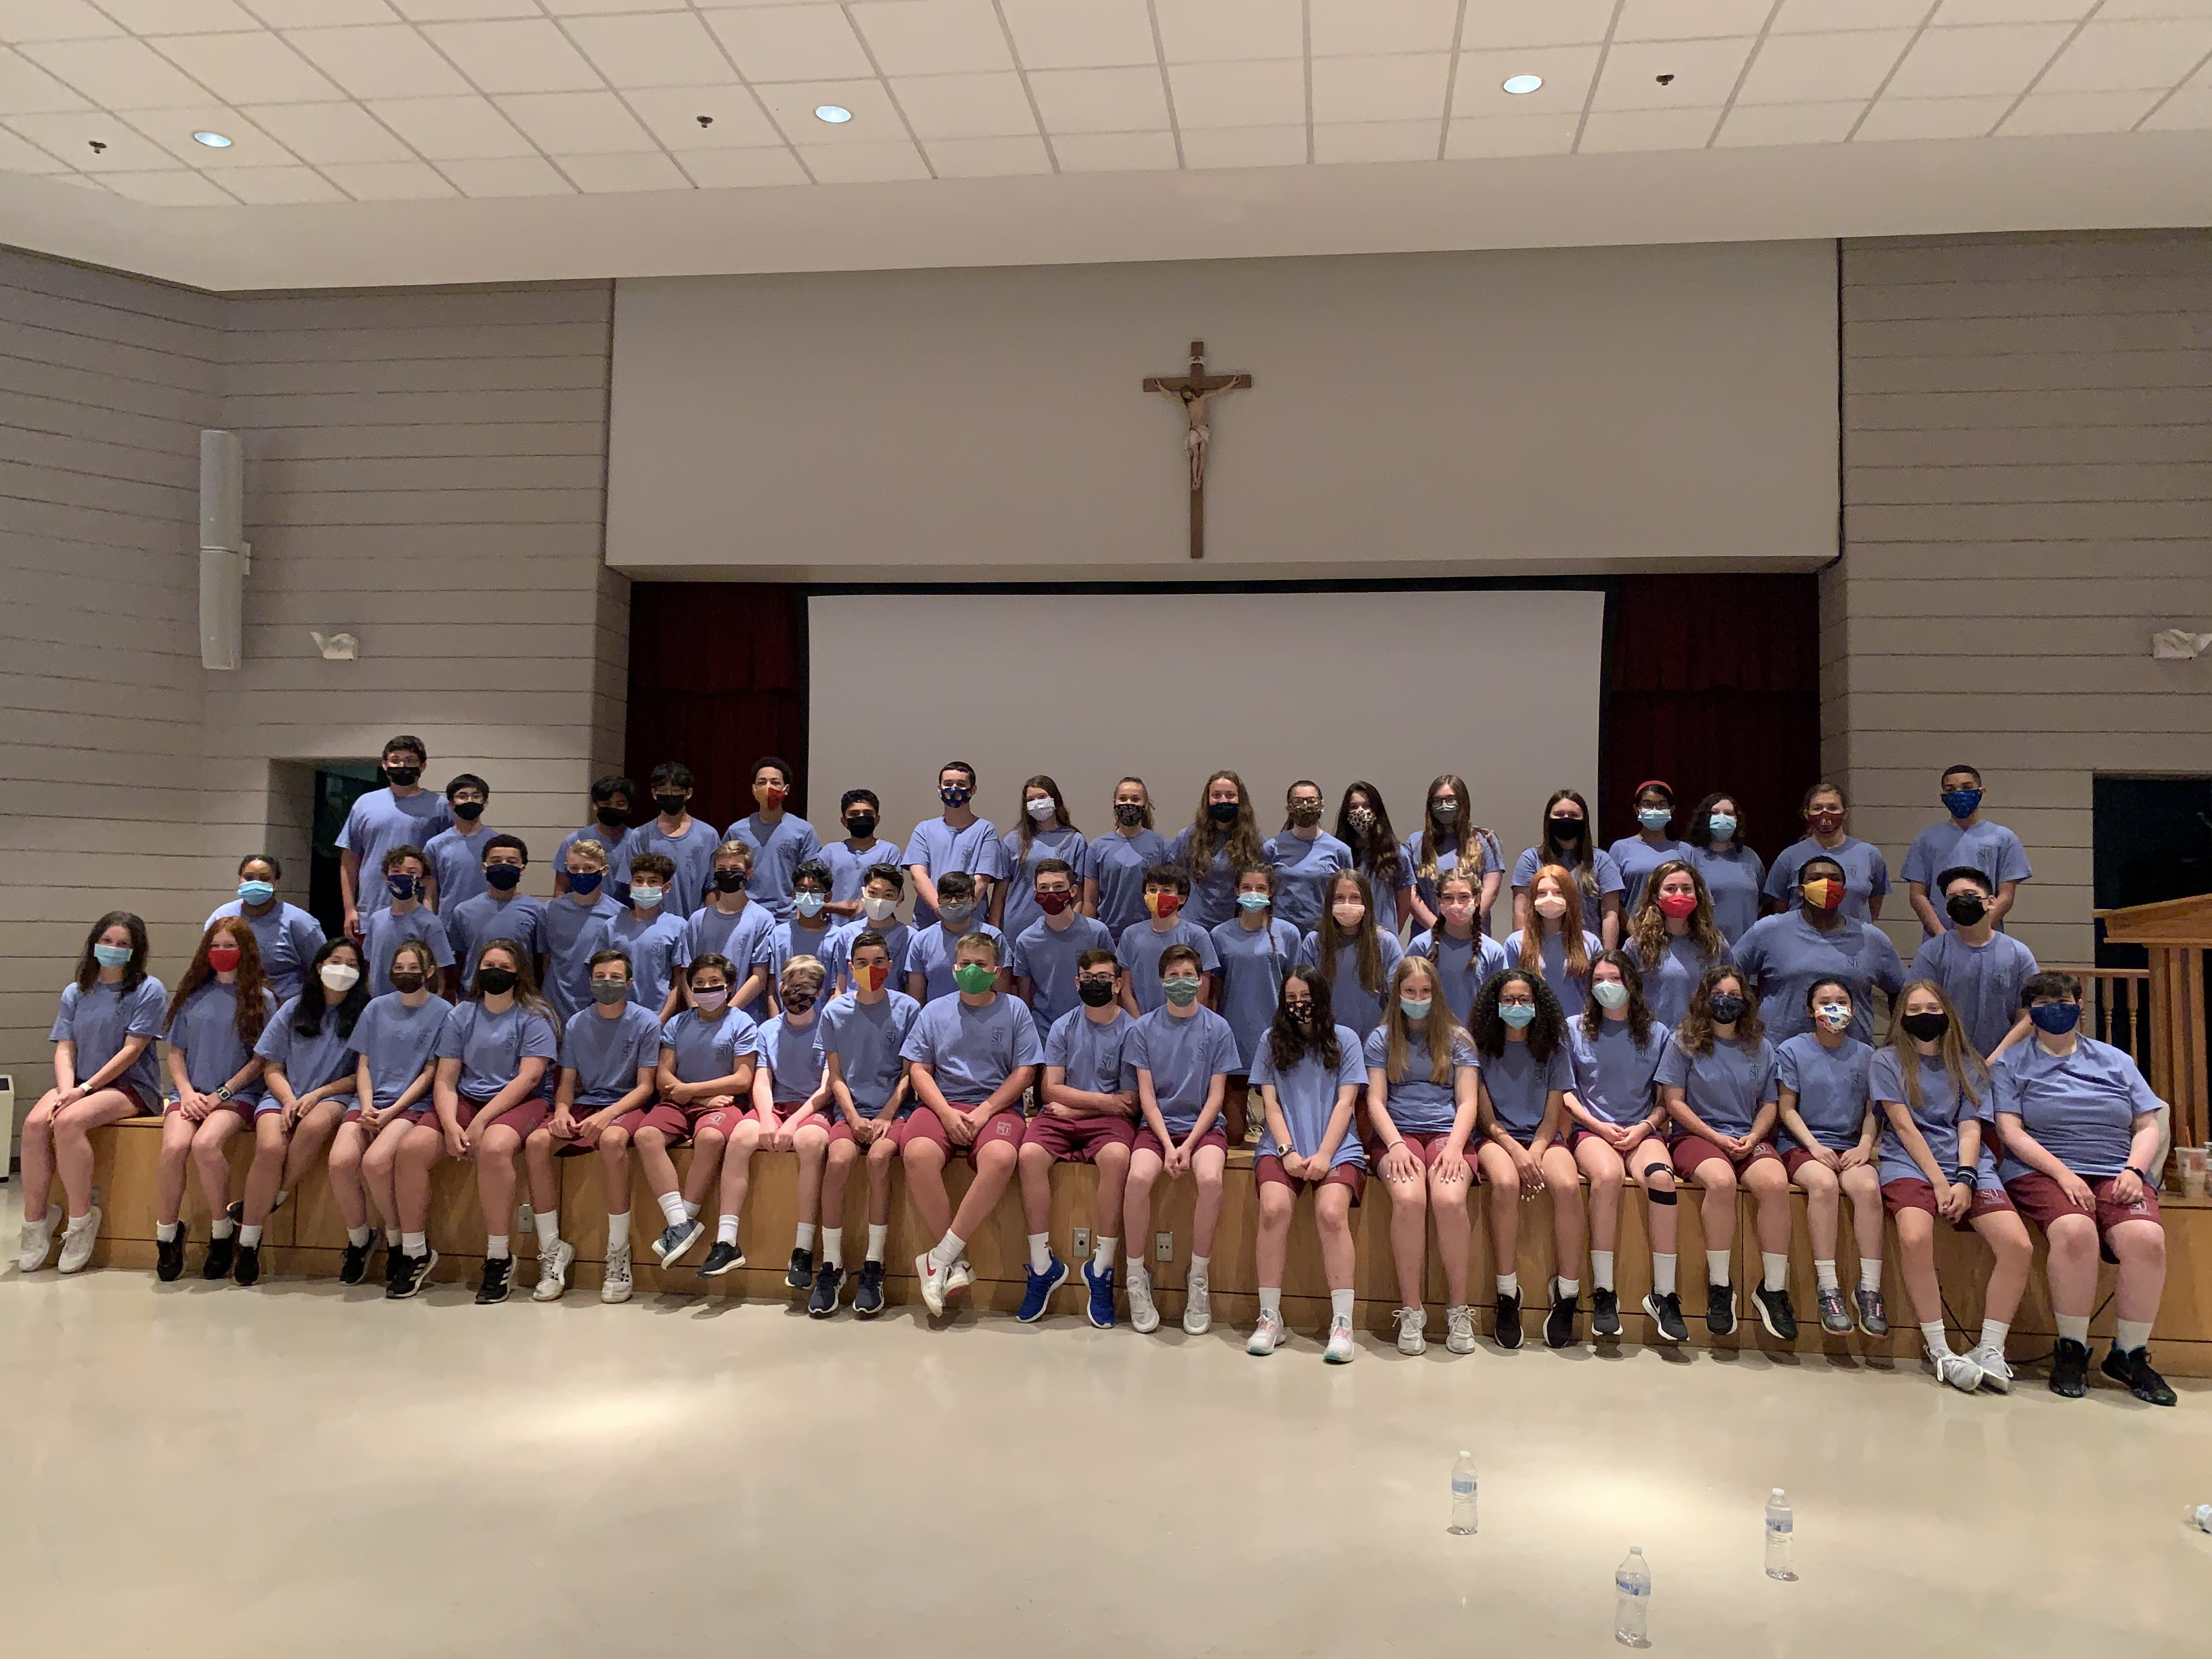 Class of 2021 - St. Joseph School - Fullerton